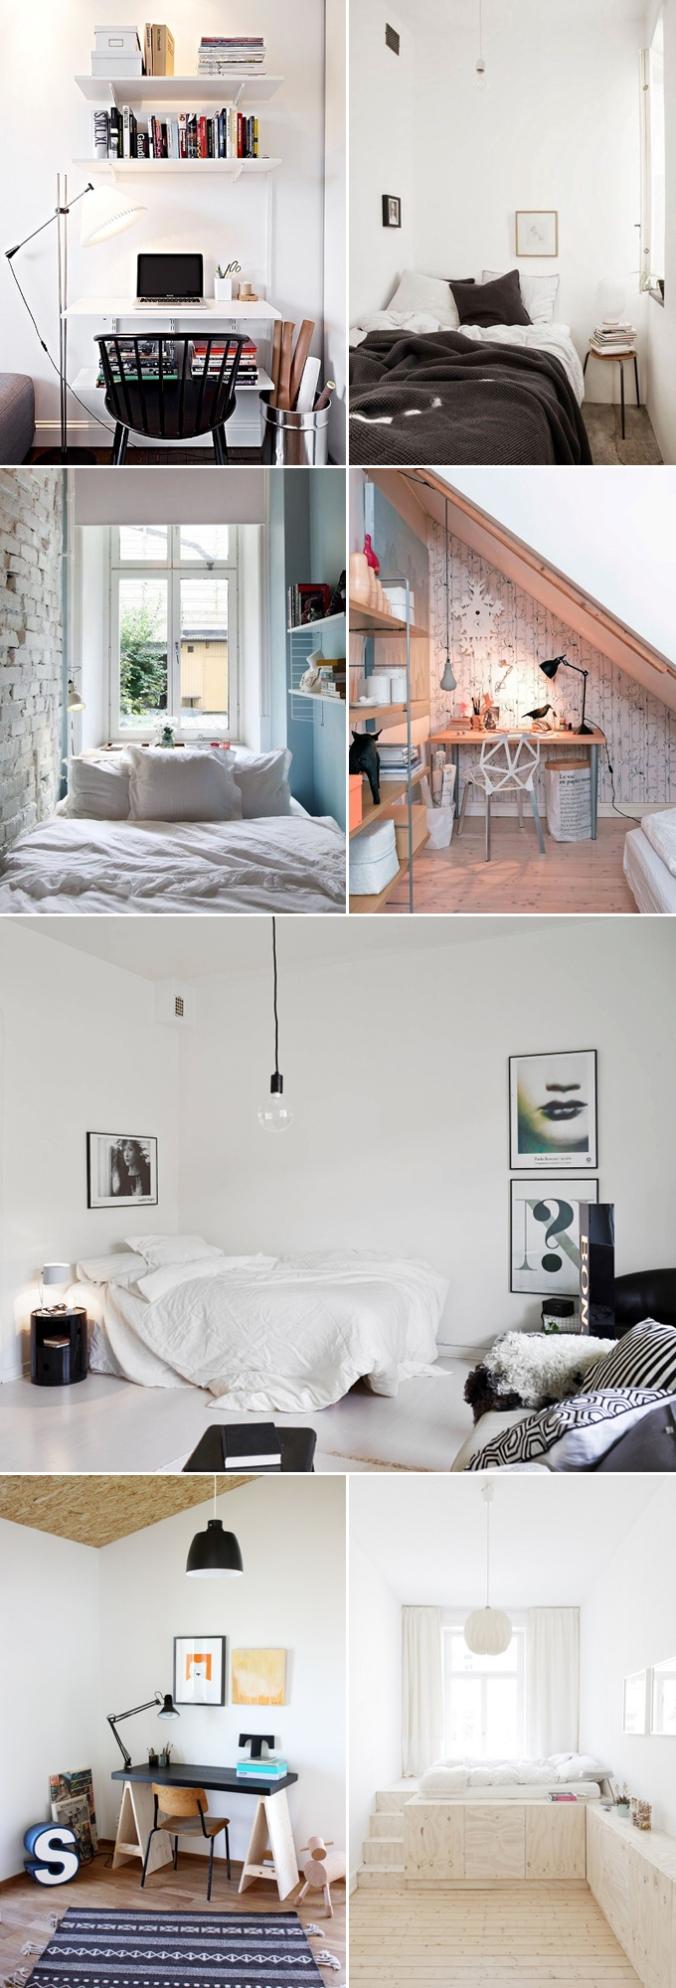 small, living, interior, design, scandinavian, style, colourfull ink, blog, aarhusblog